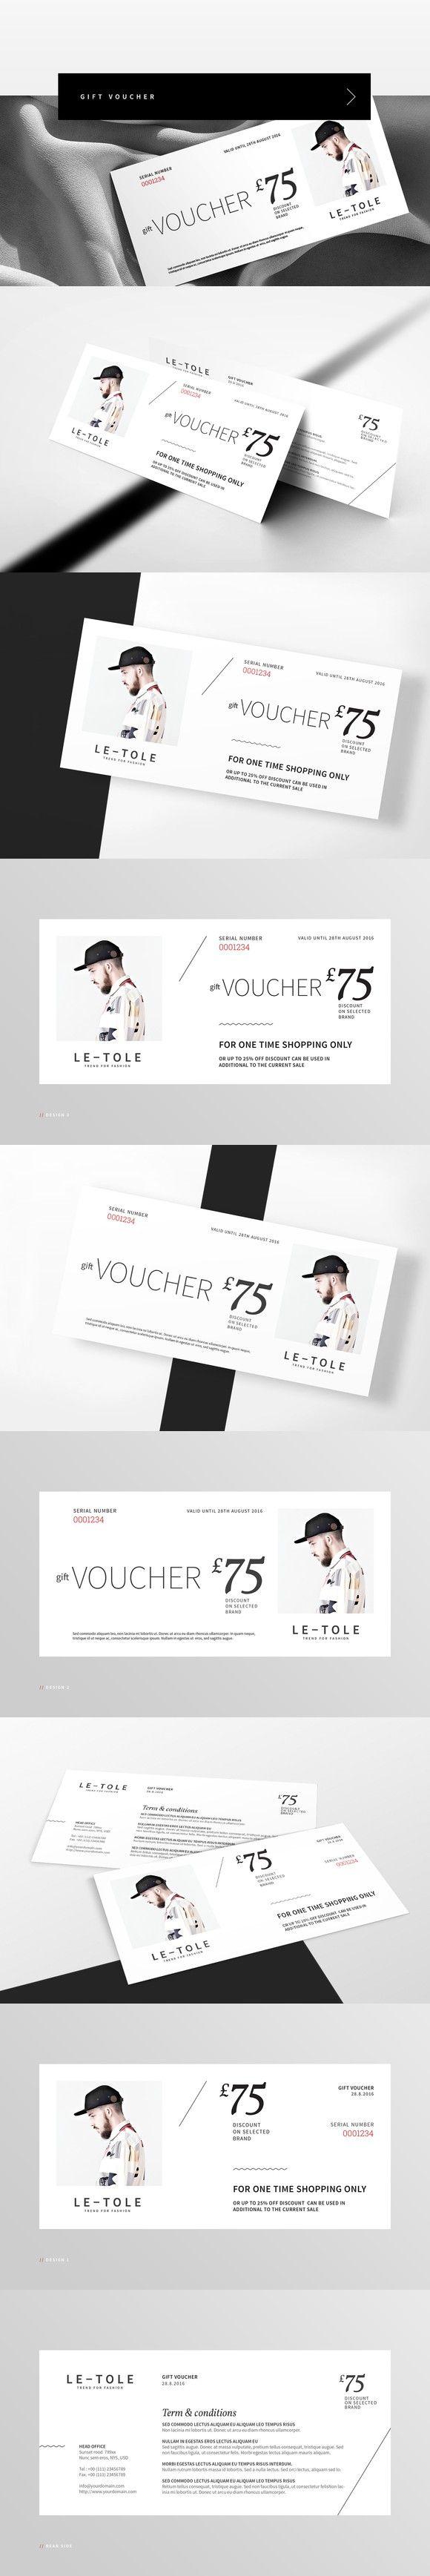 Fashion Gift Voucher